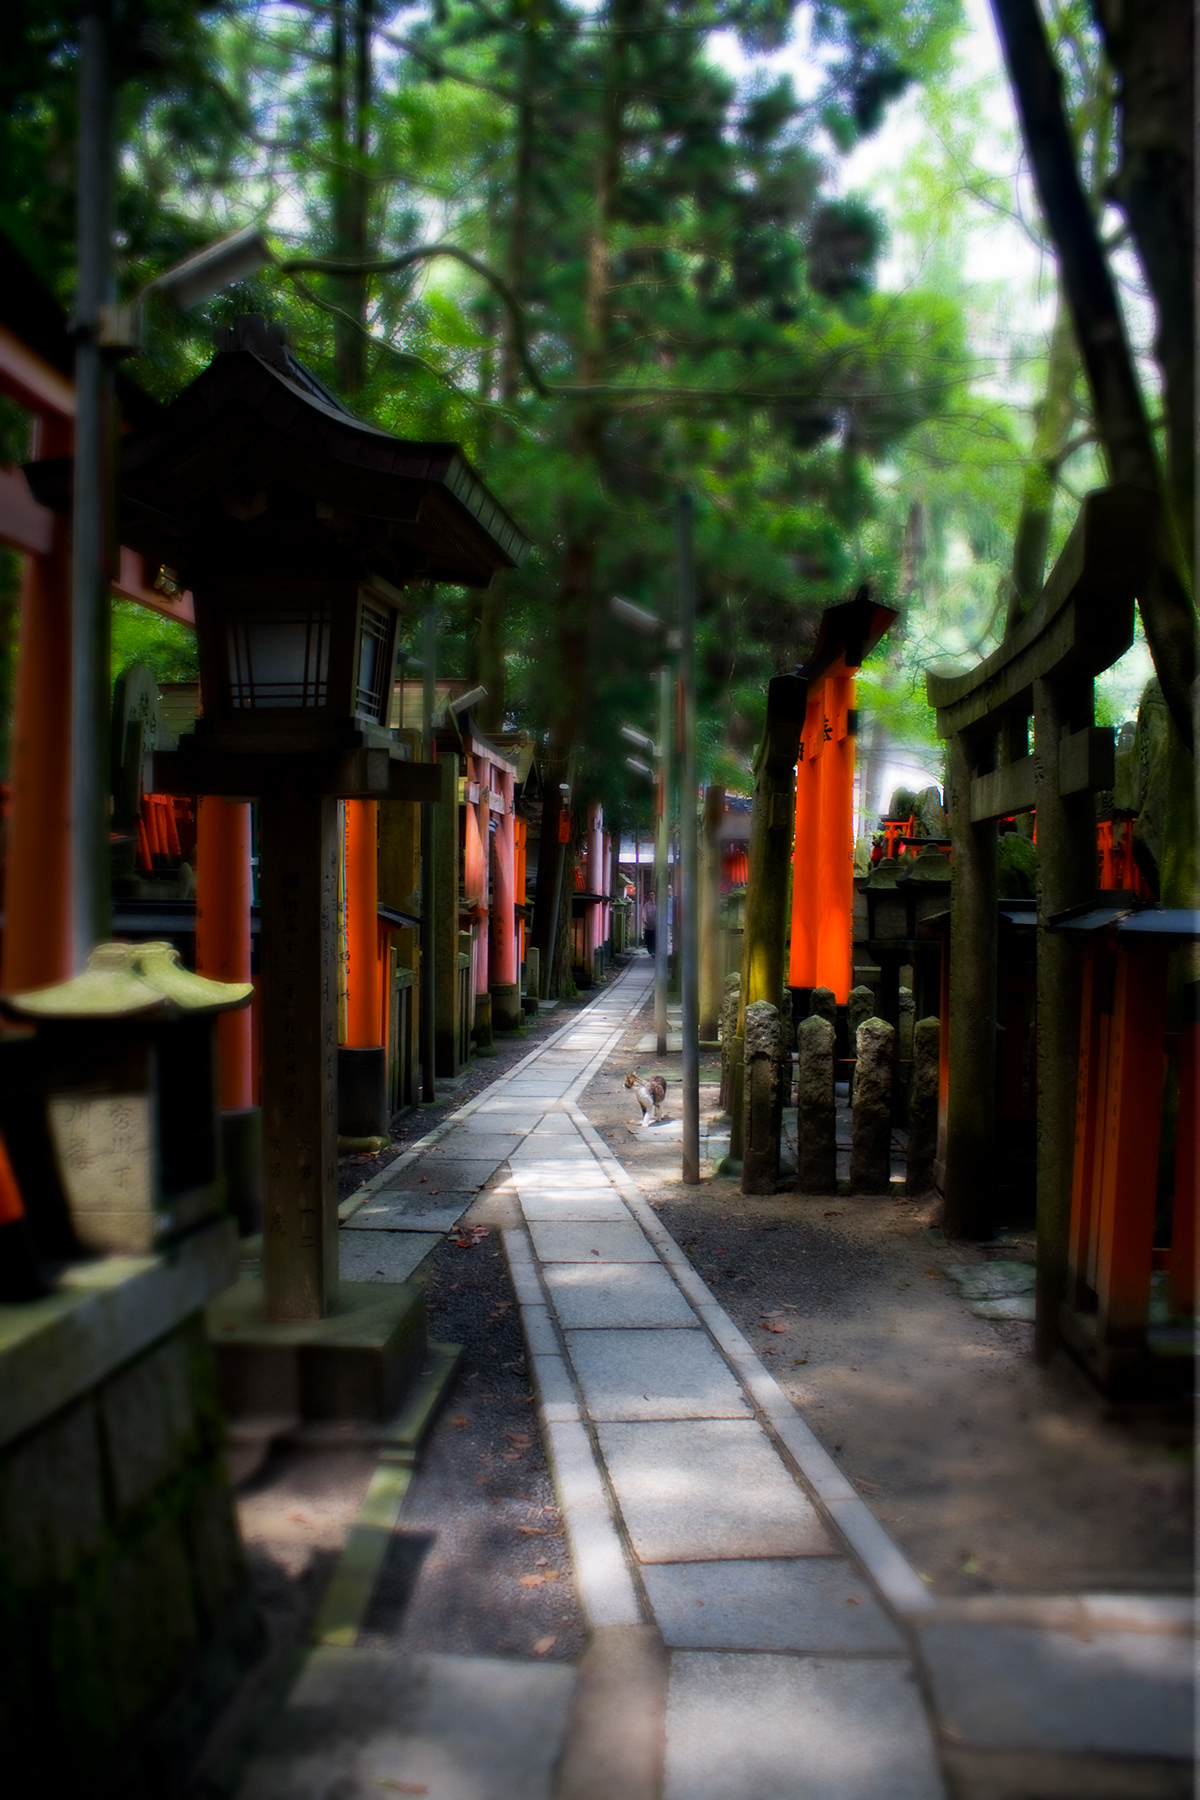 Adobe Portfolio asia fushimi-ku Inari japan kyoto shinto Shrine temple